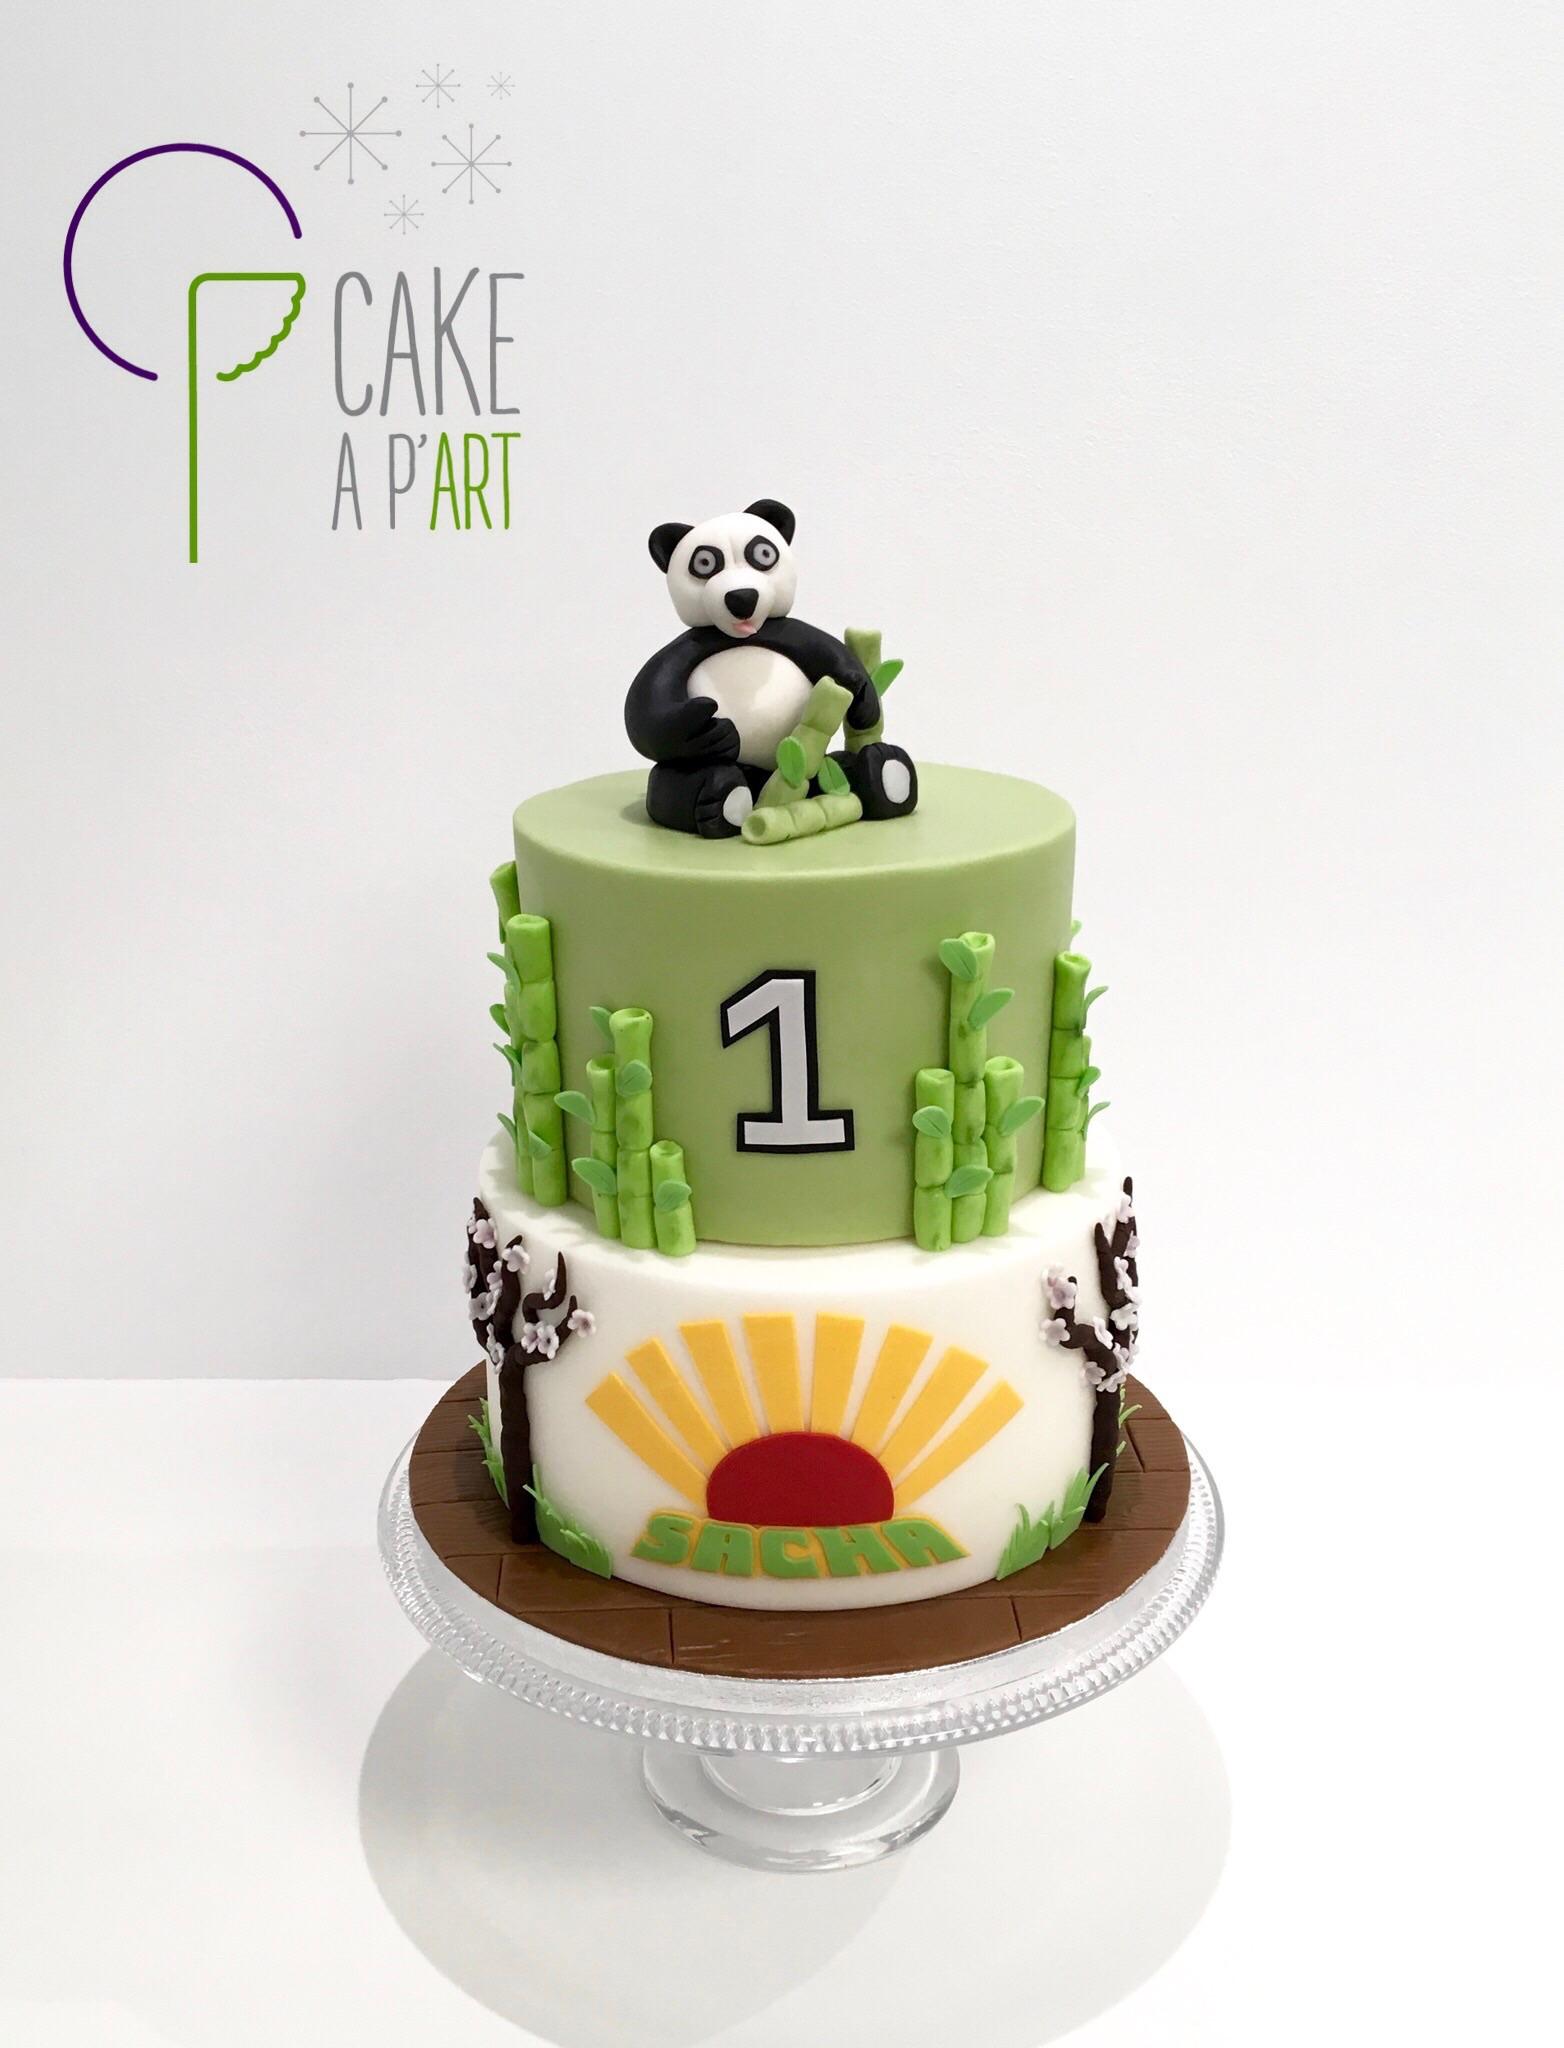 gateau-anniversaire-panda-asie-cakeapart